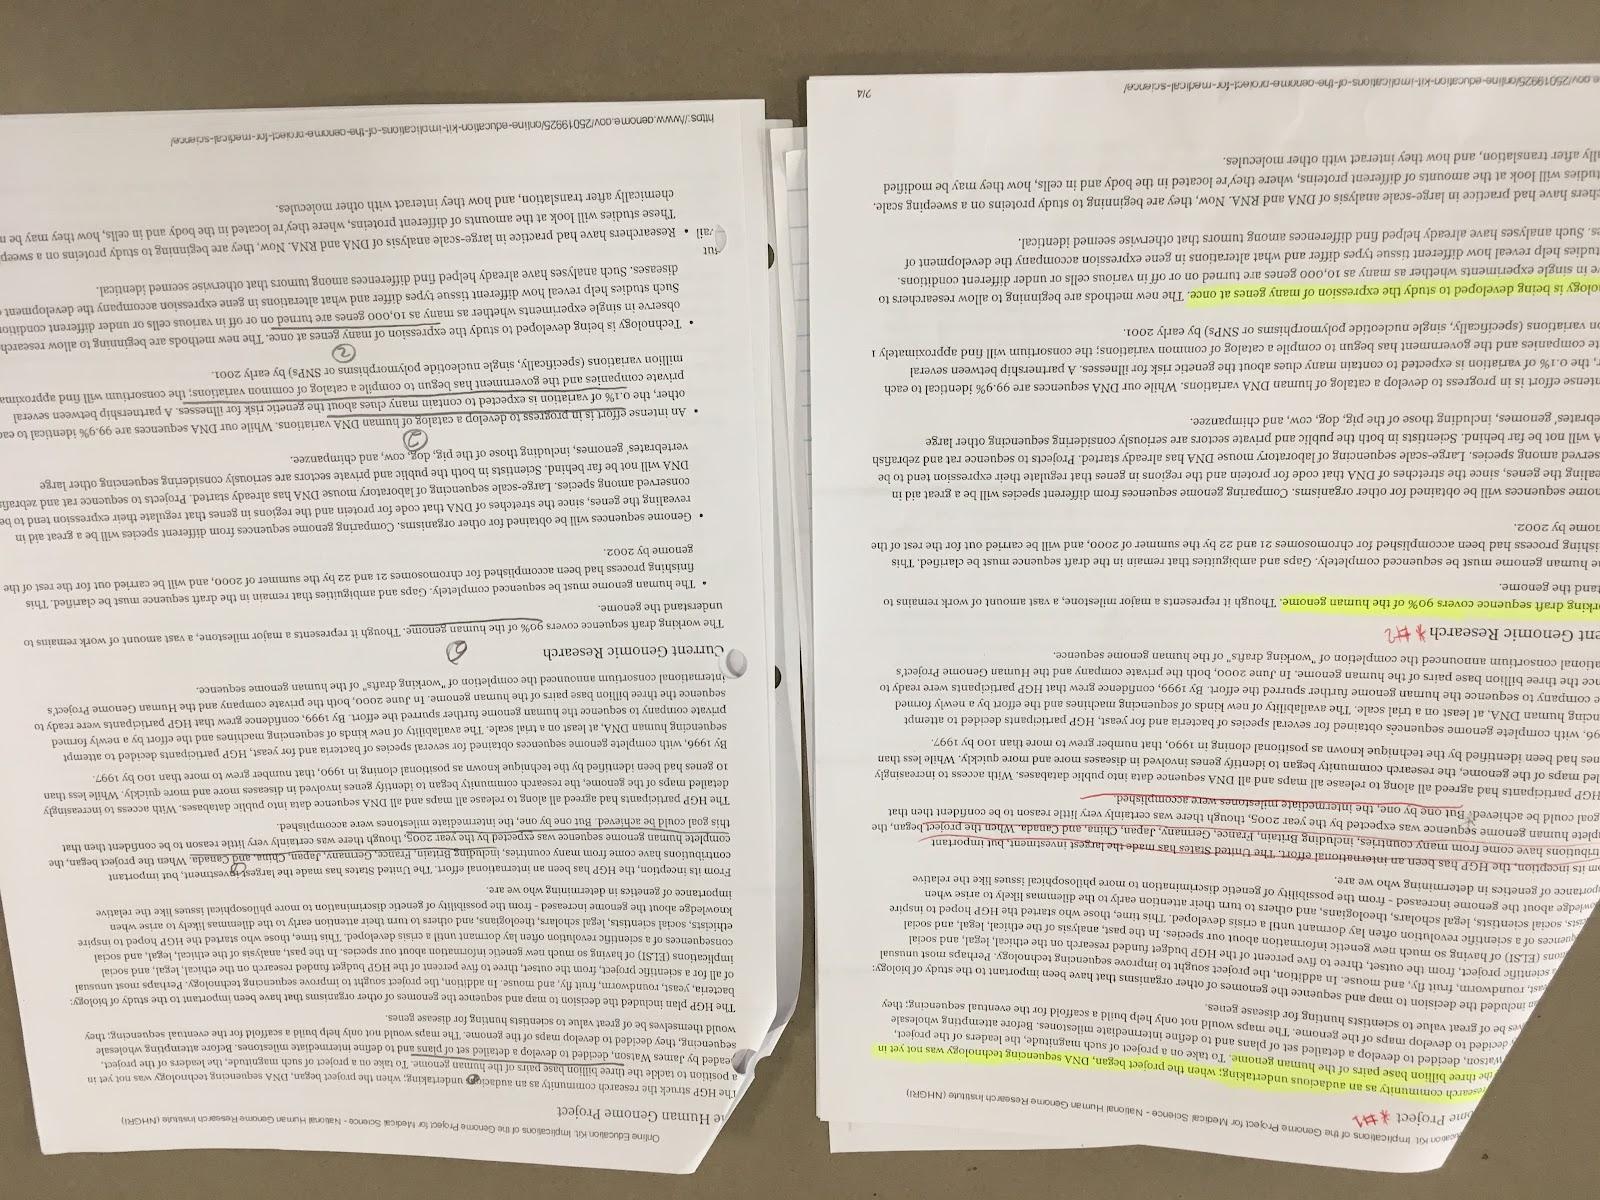 Censorship of the media essay